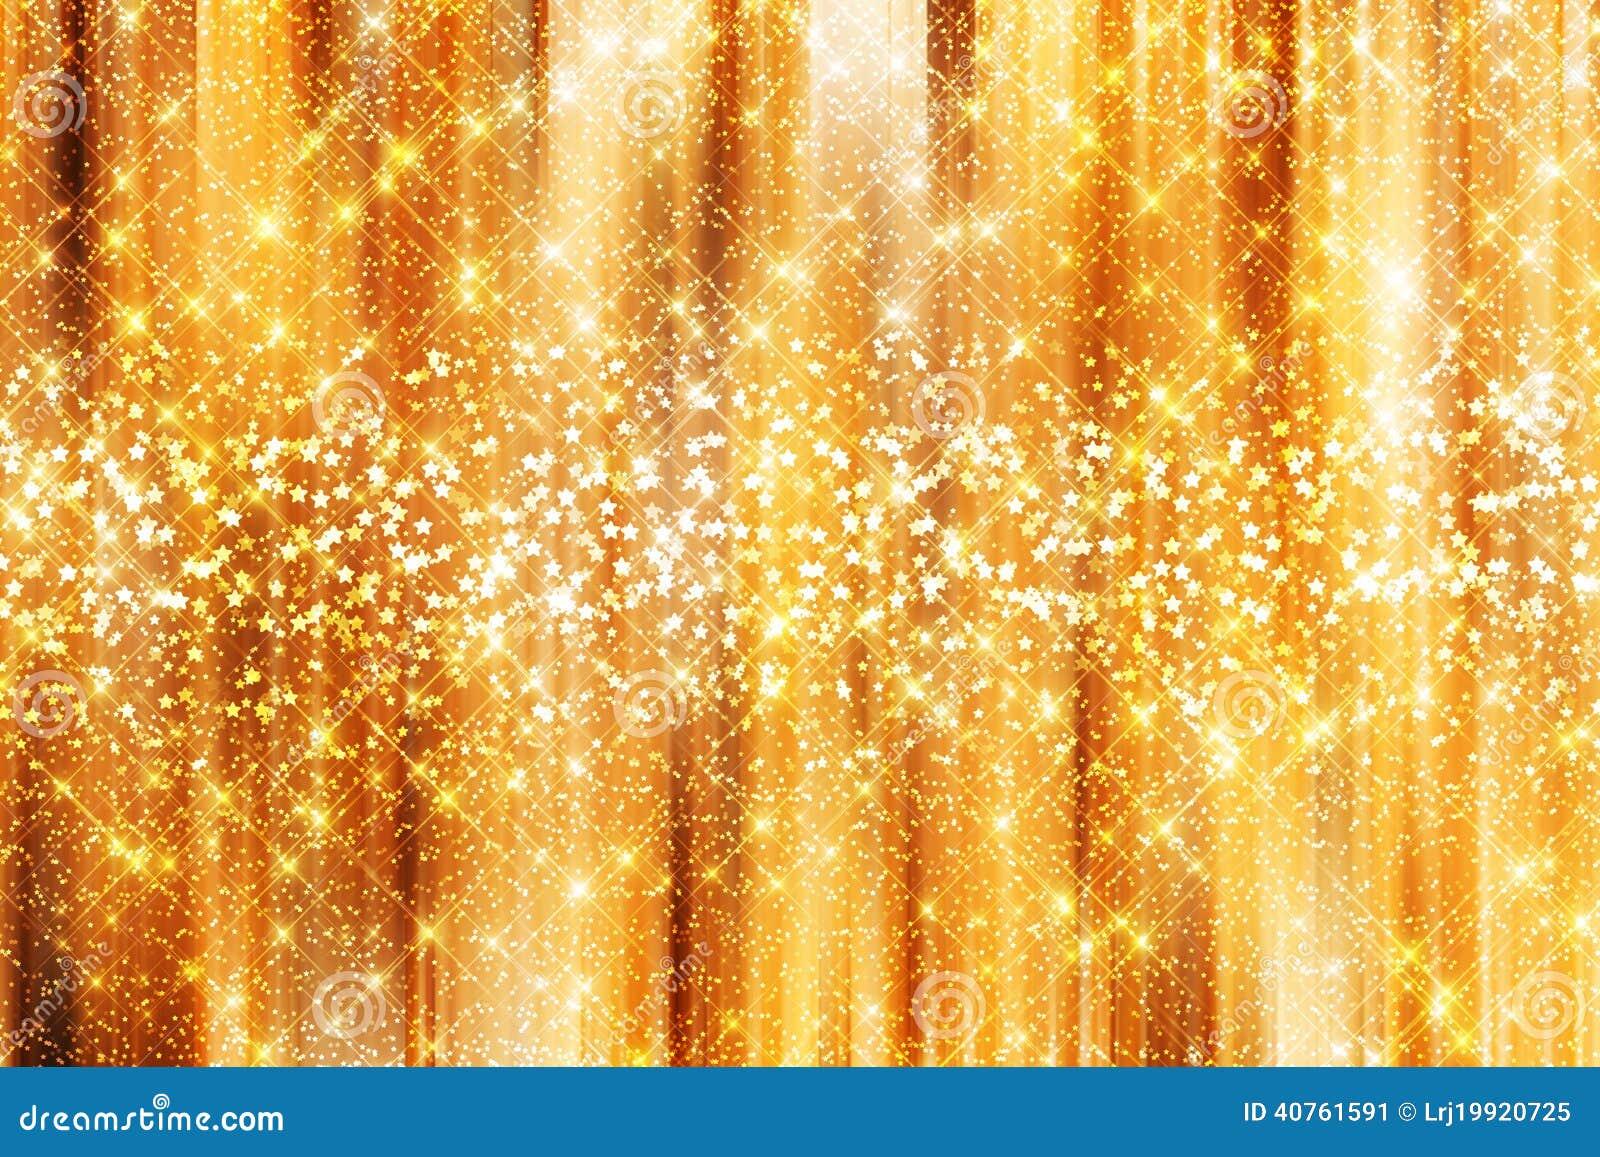 Gold Sparkle Background Stock Photo - Image: 40761591